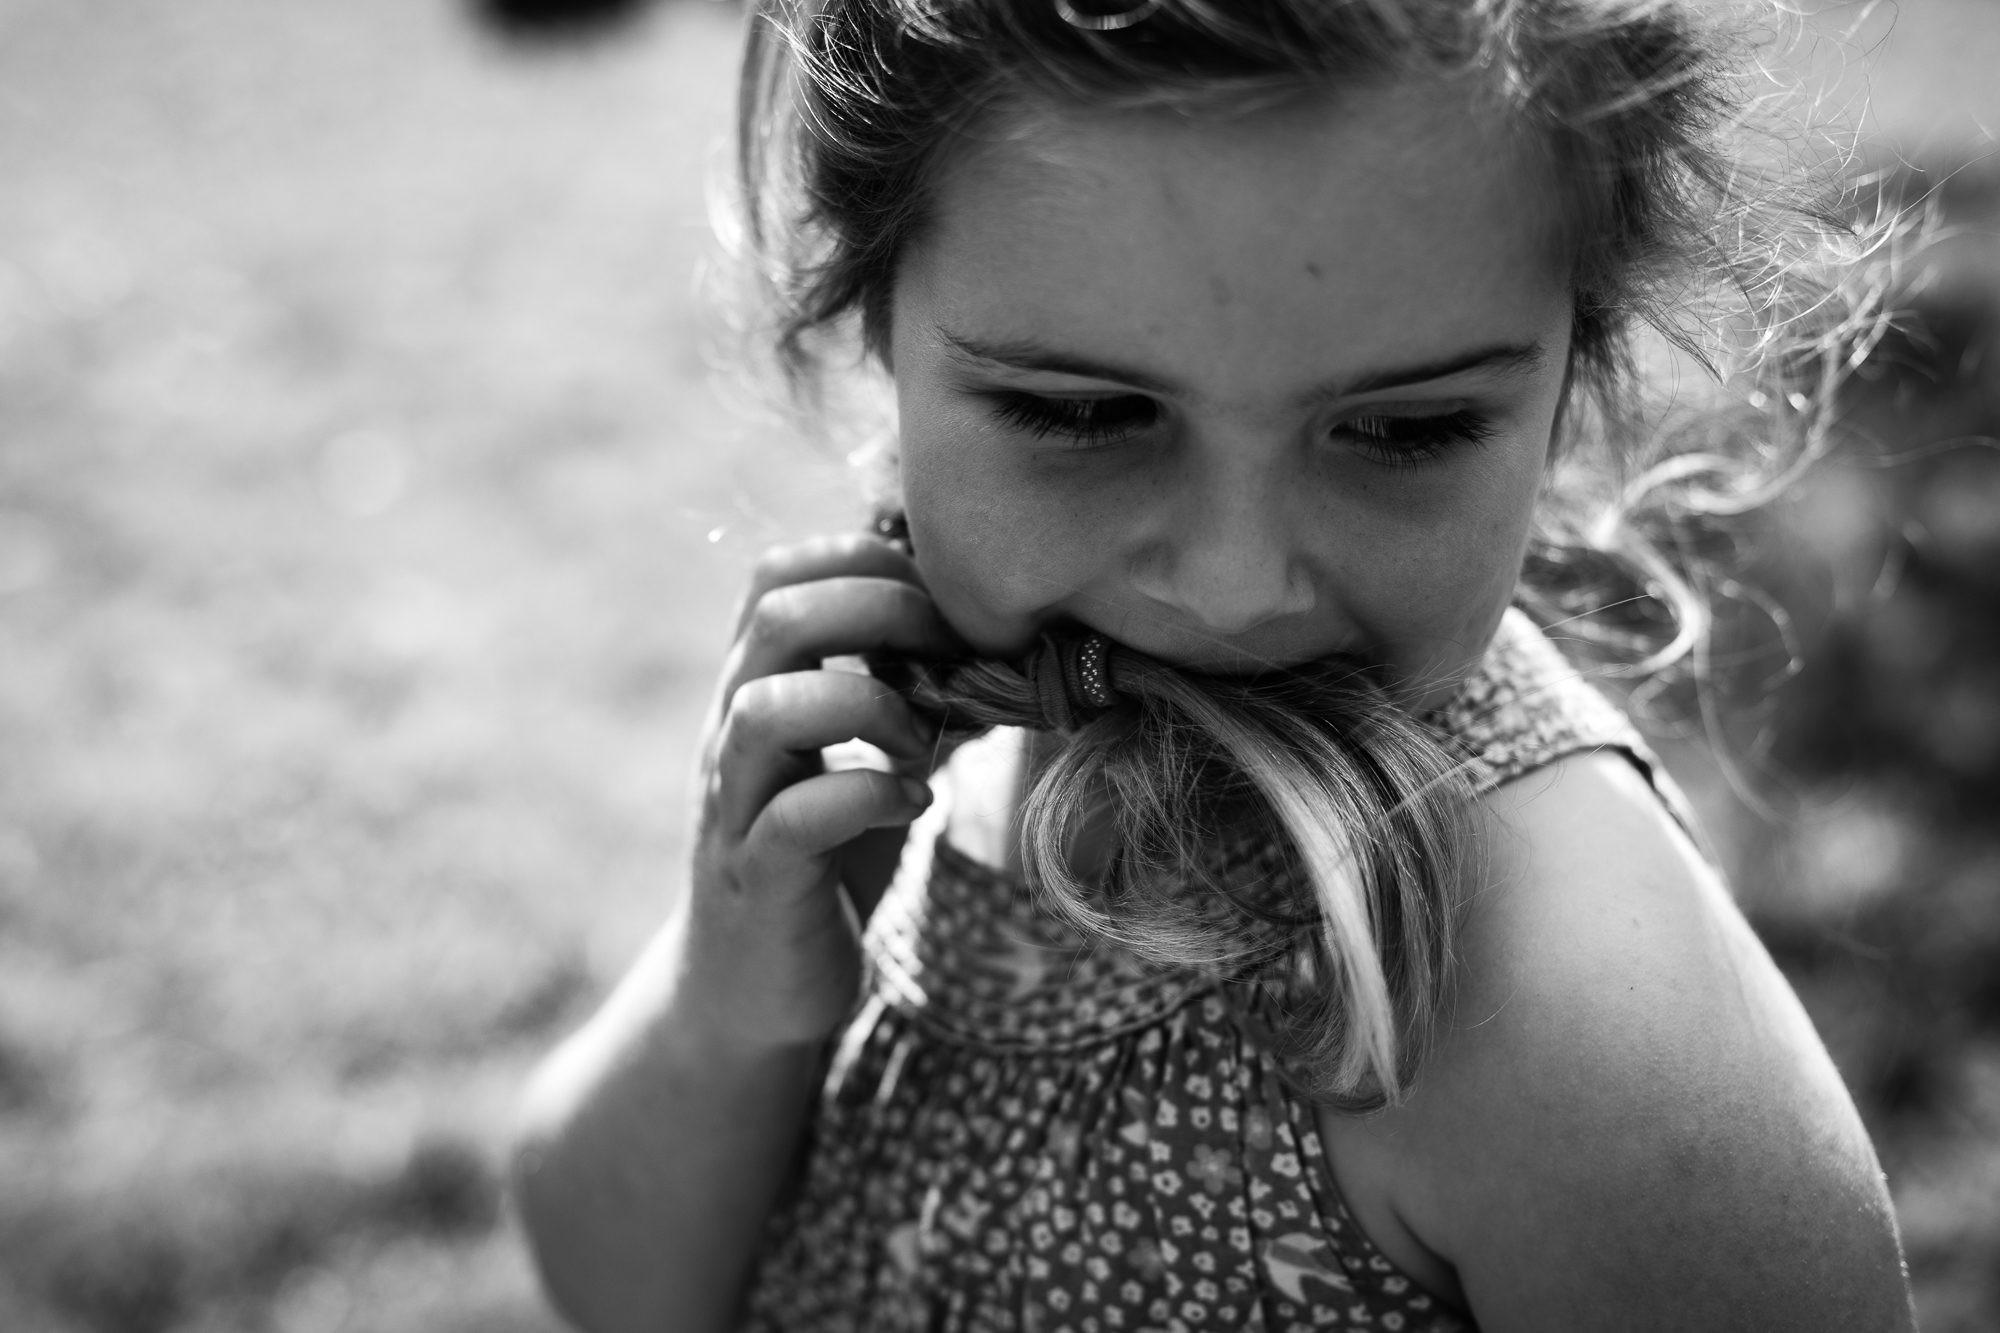 Alice Chapman Photography documentary artful children's photos Cambridge